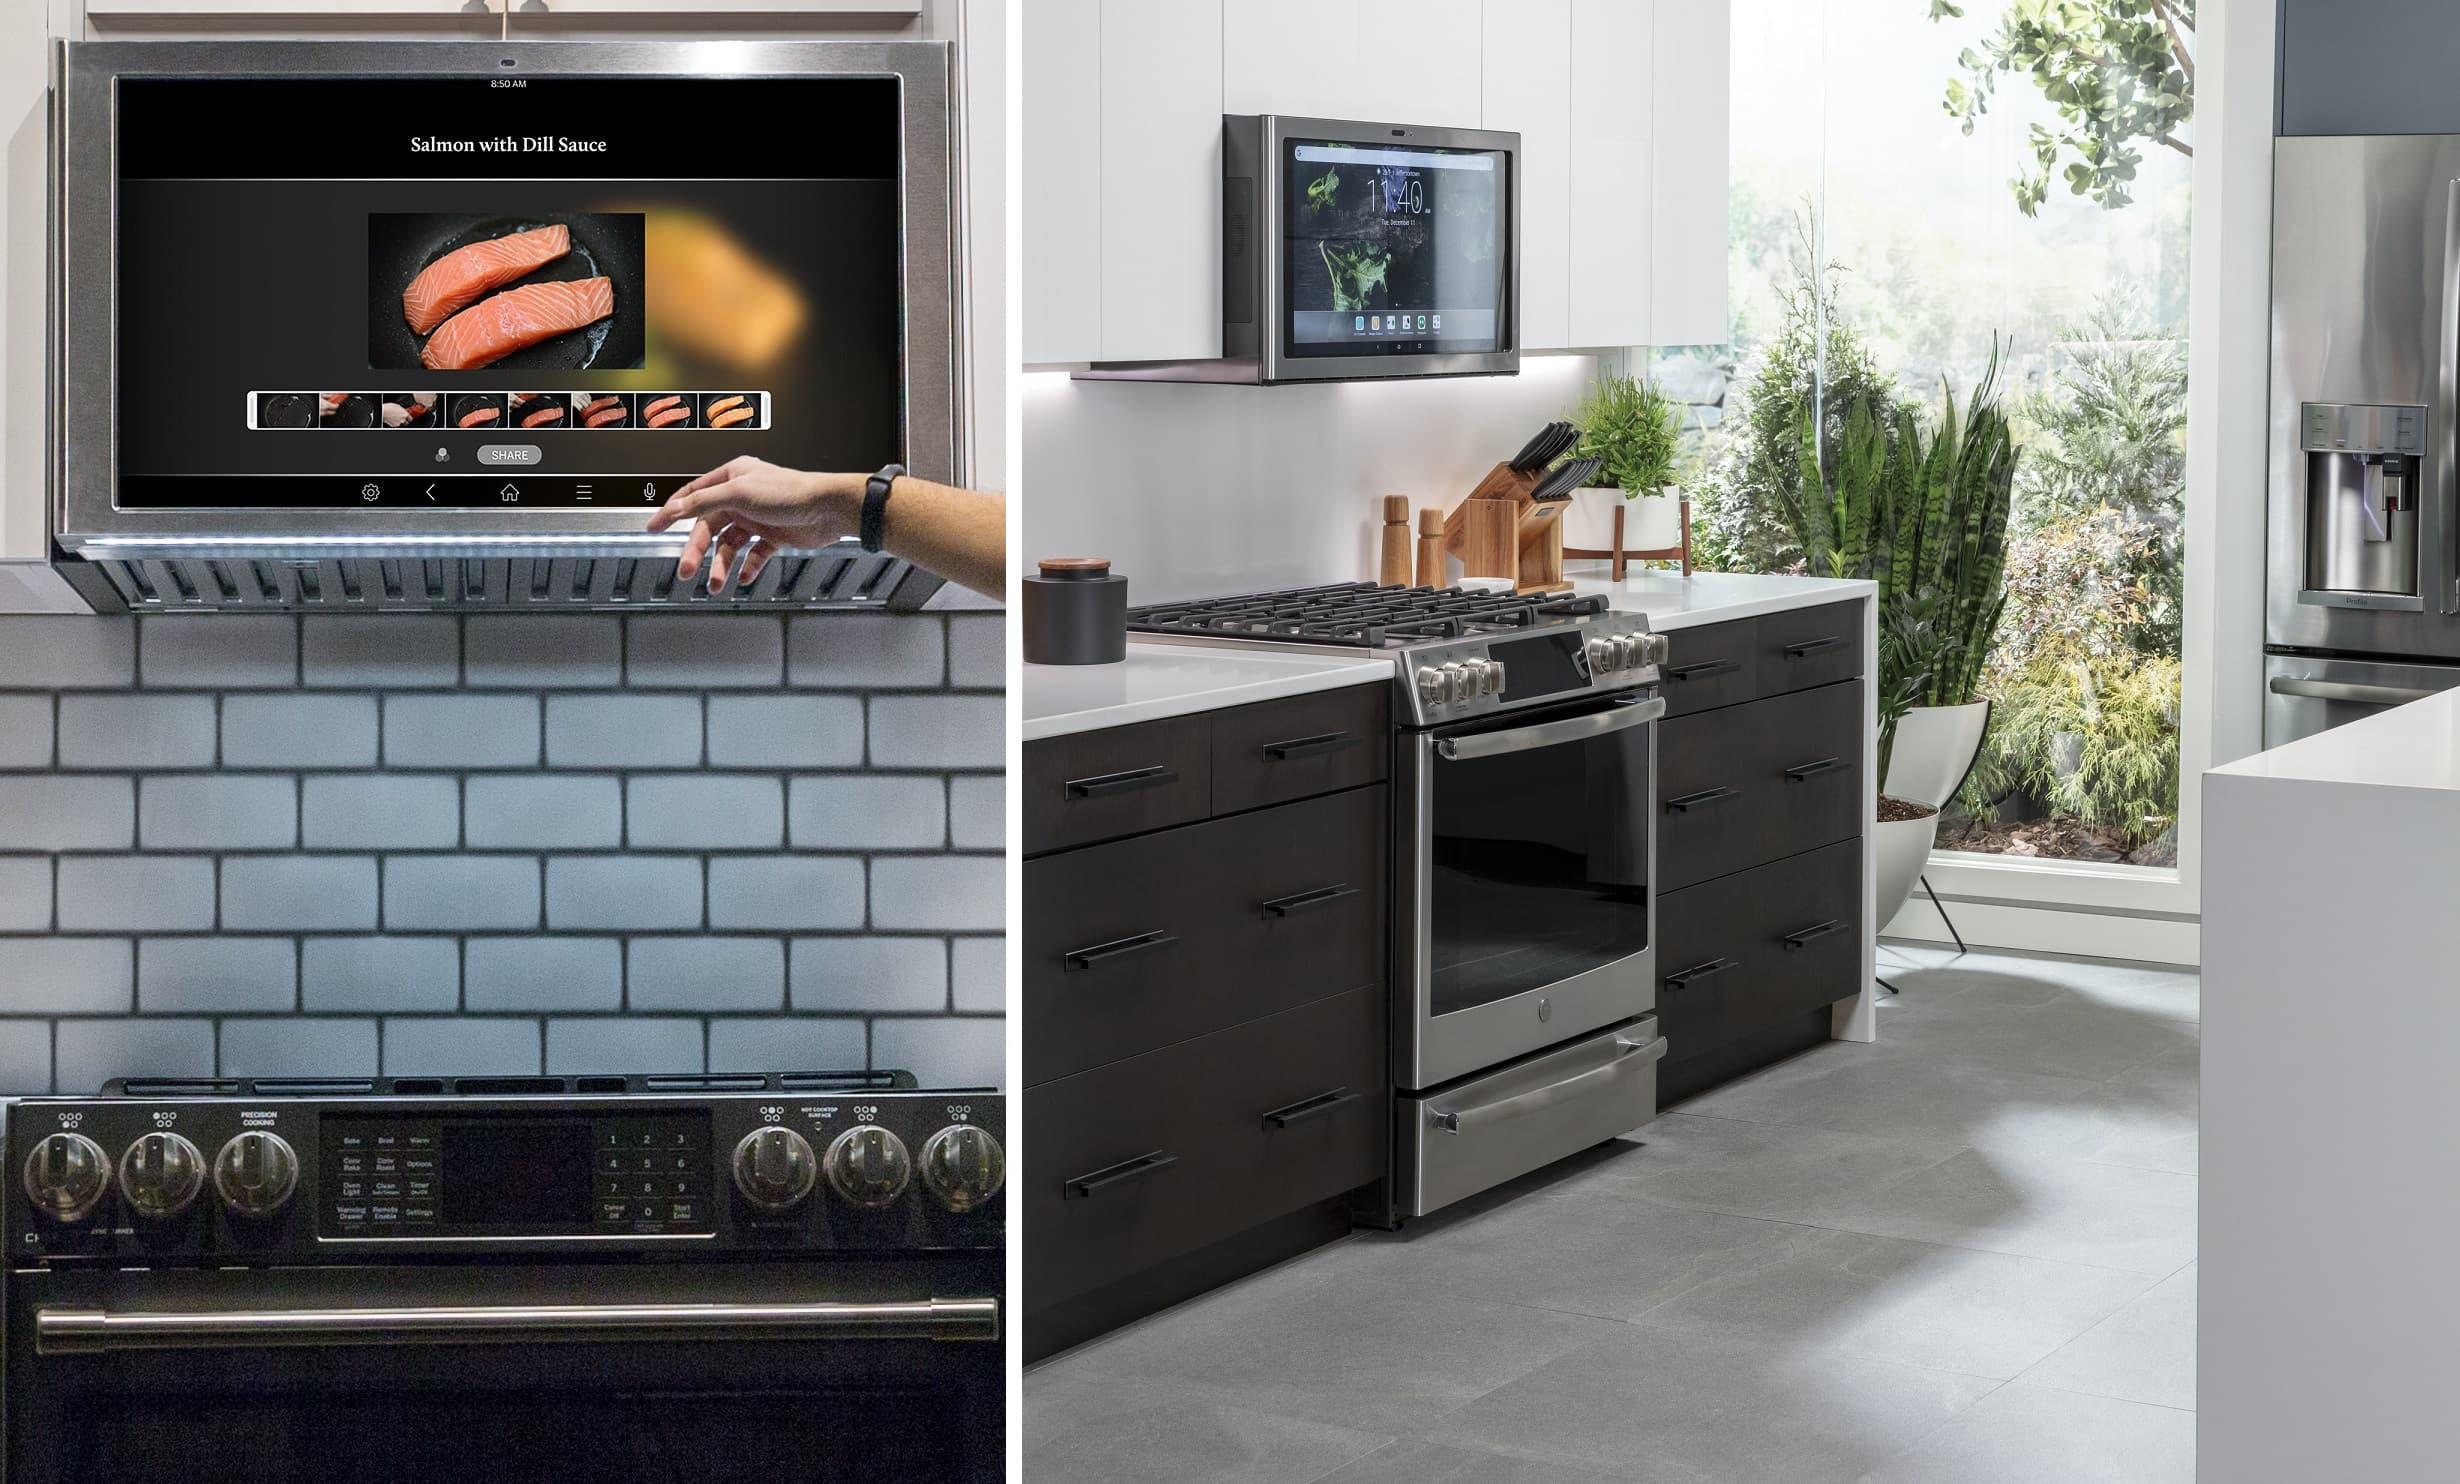 GE Kitchen Hub 2020 smart okap i mikrofalówka z Asystentem Google